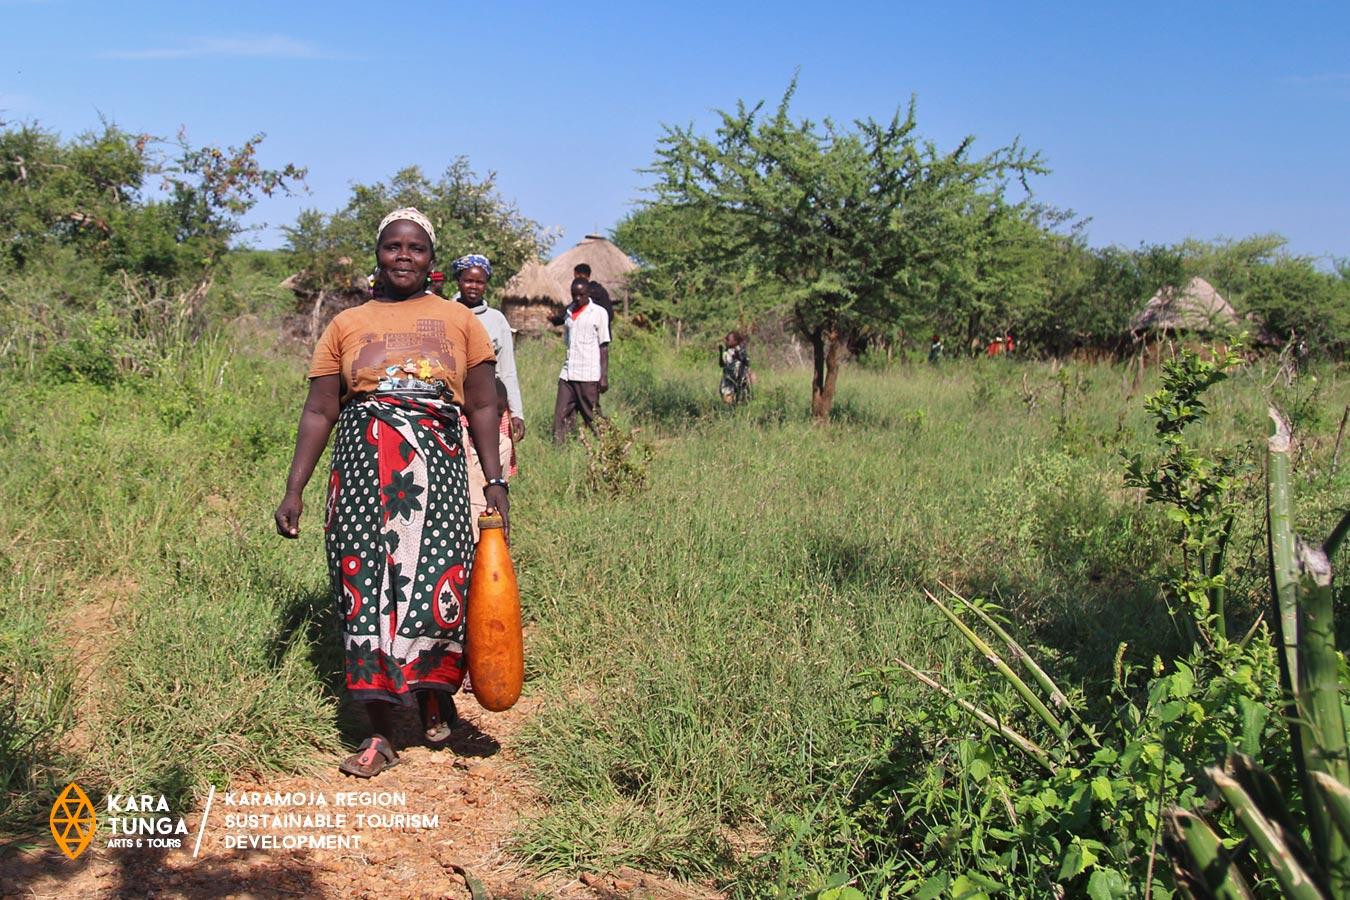 kara-tunga-karamoja-uganda-tours-kalia-peace-village-amudat-pokot-culture